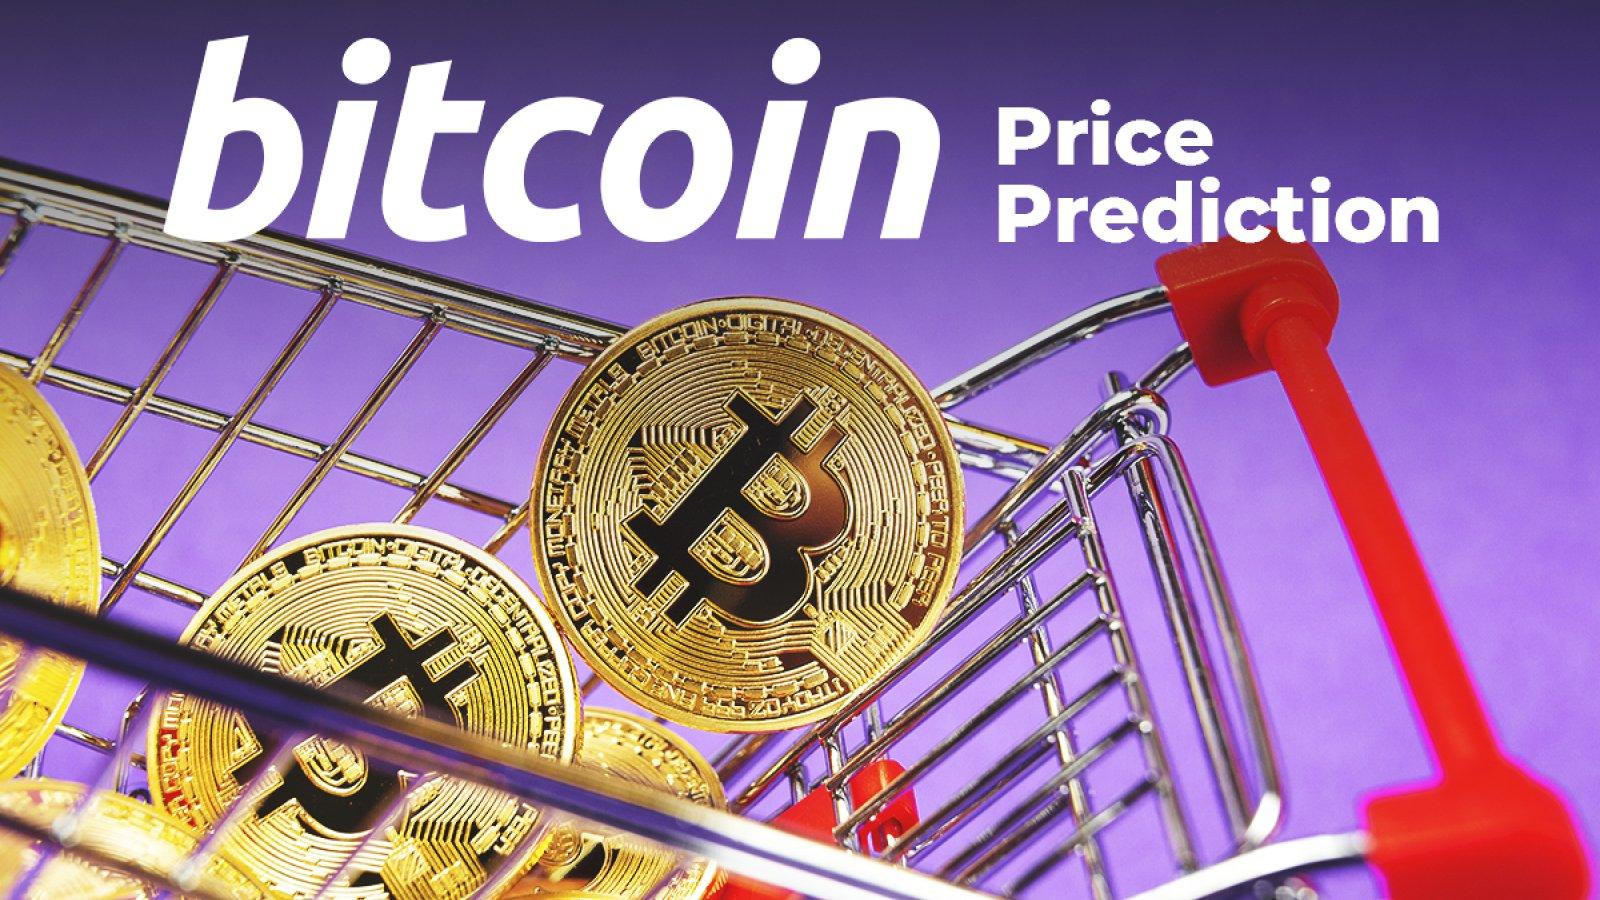 Worst Bitcoin Price Prediction of 2019